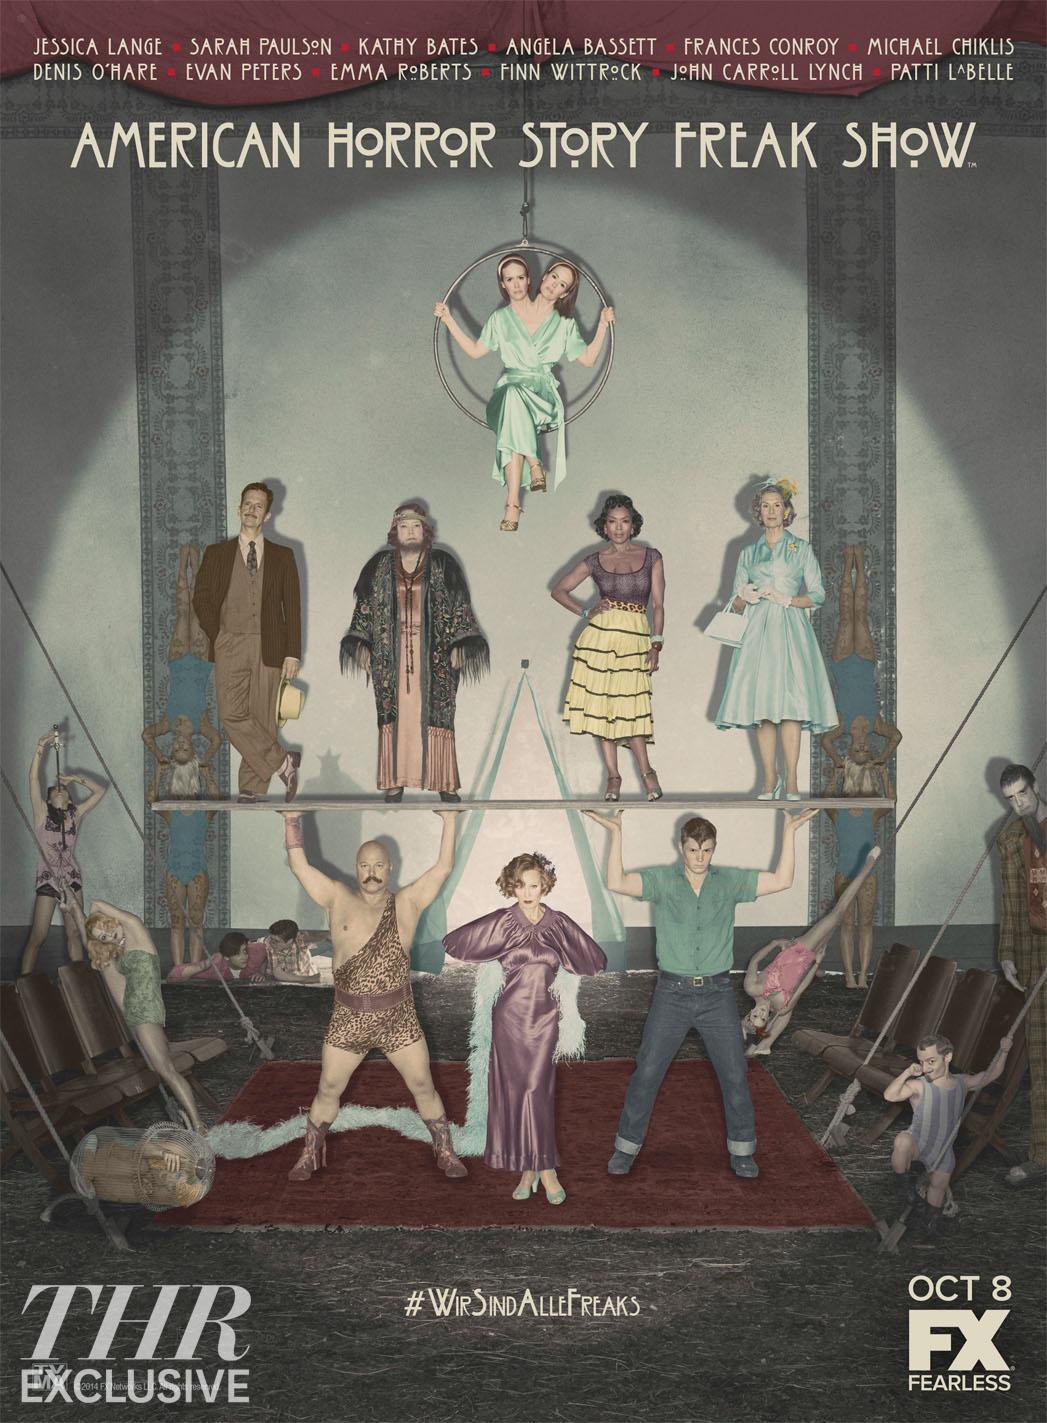 AHS Freak Show Cast Art - P 2014